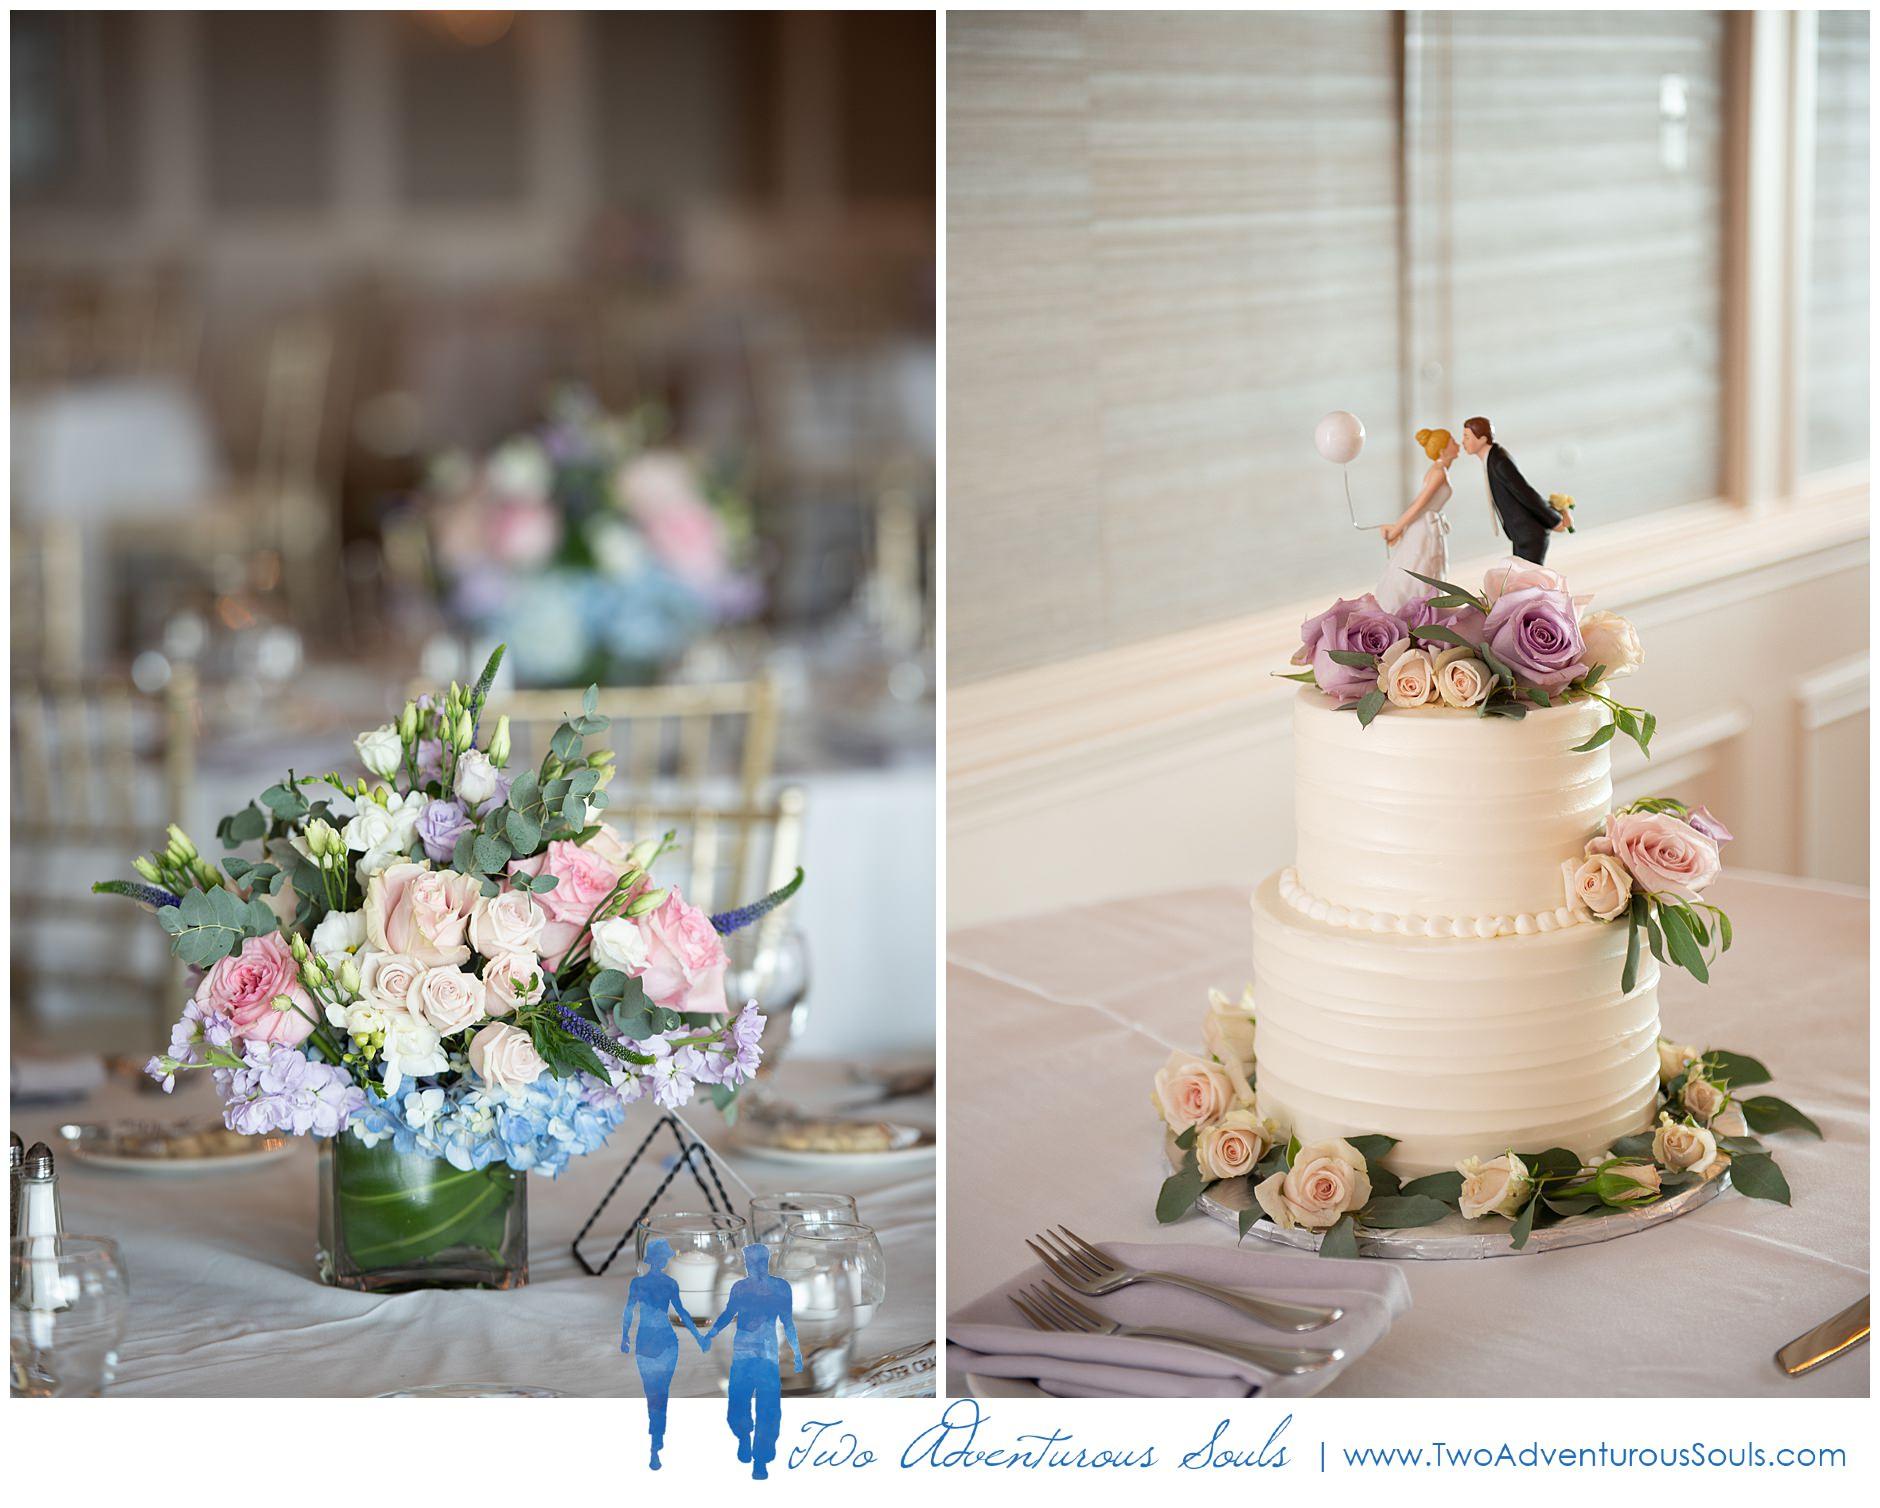 Cape Cod Wedding Photographers, Destination Wedding Photographers, Two Adventurous Souls-081019_0040.jpg